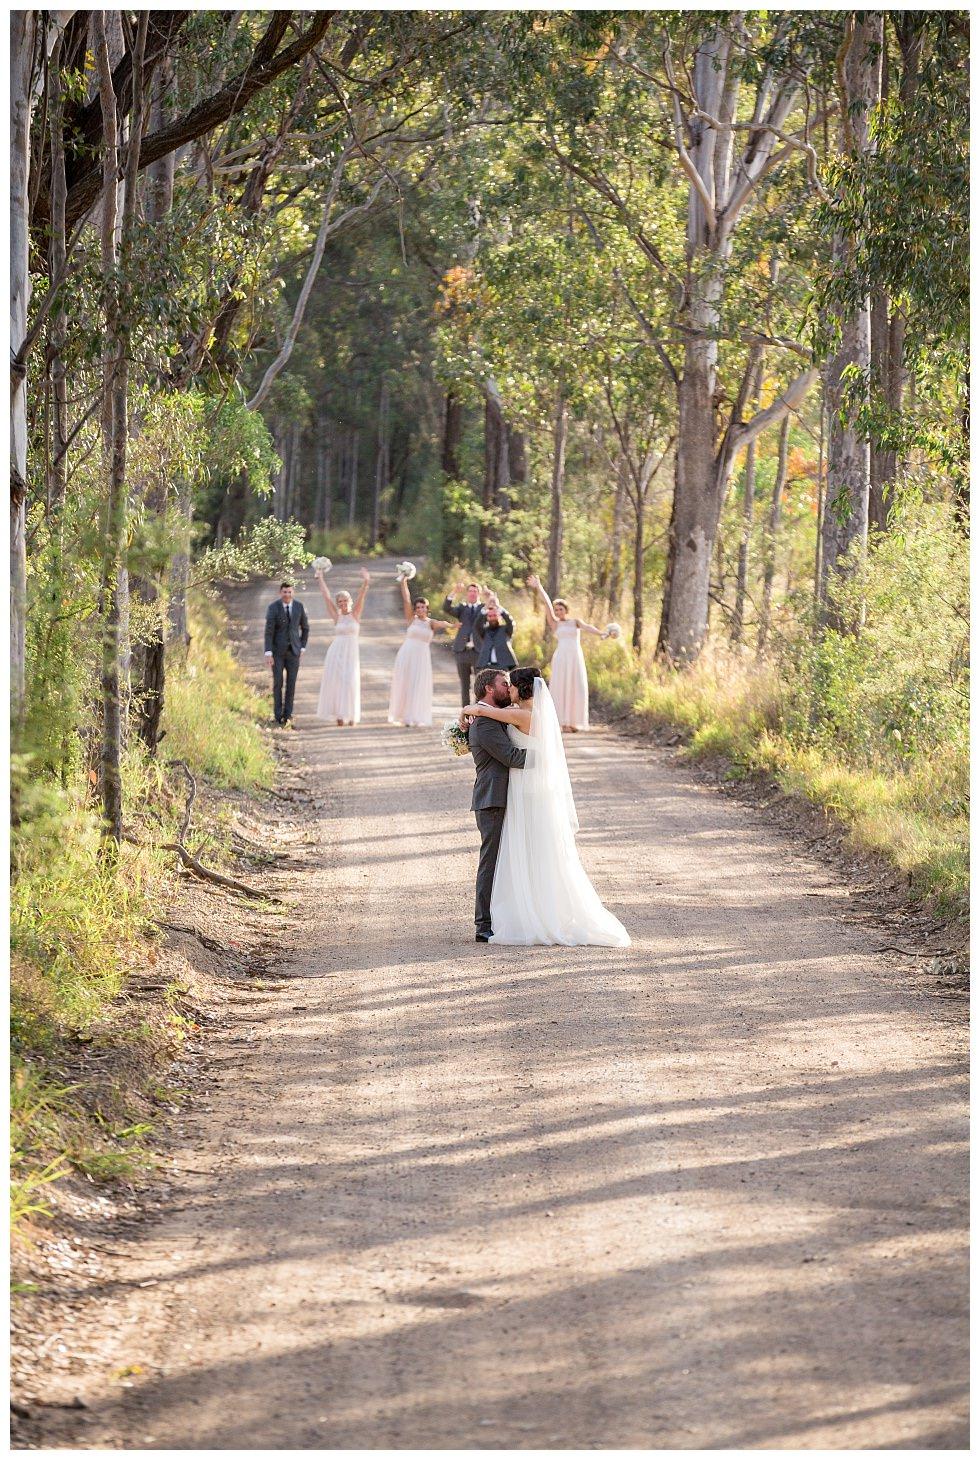 ArtyJ Photography | © Popcorn Photography – Used with Permission, Peppers Creek, Spring Wedding, Wedding, Pokolbin, Australia, NSW, Hunter Valley, Photography | Sam & Dan | Wedding